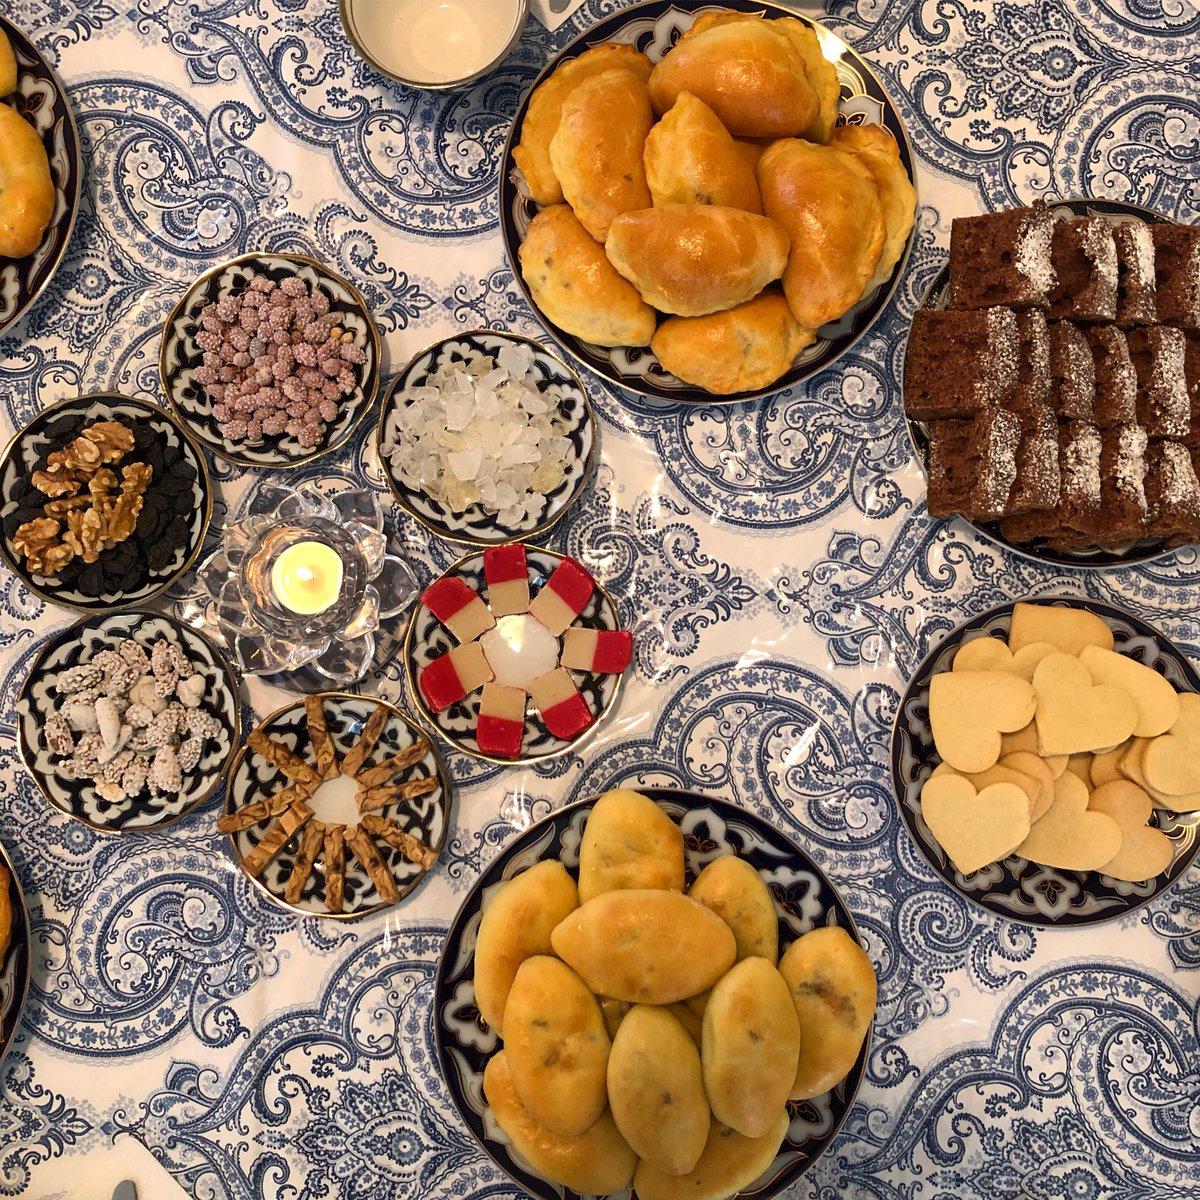 Brian Cicioni On Twitter Have You Tried Uzbekistan Food